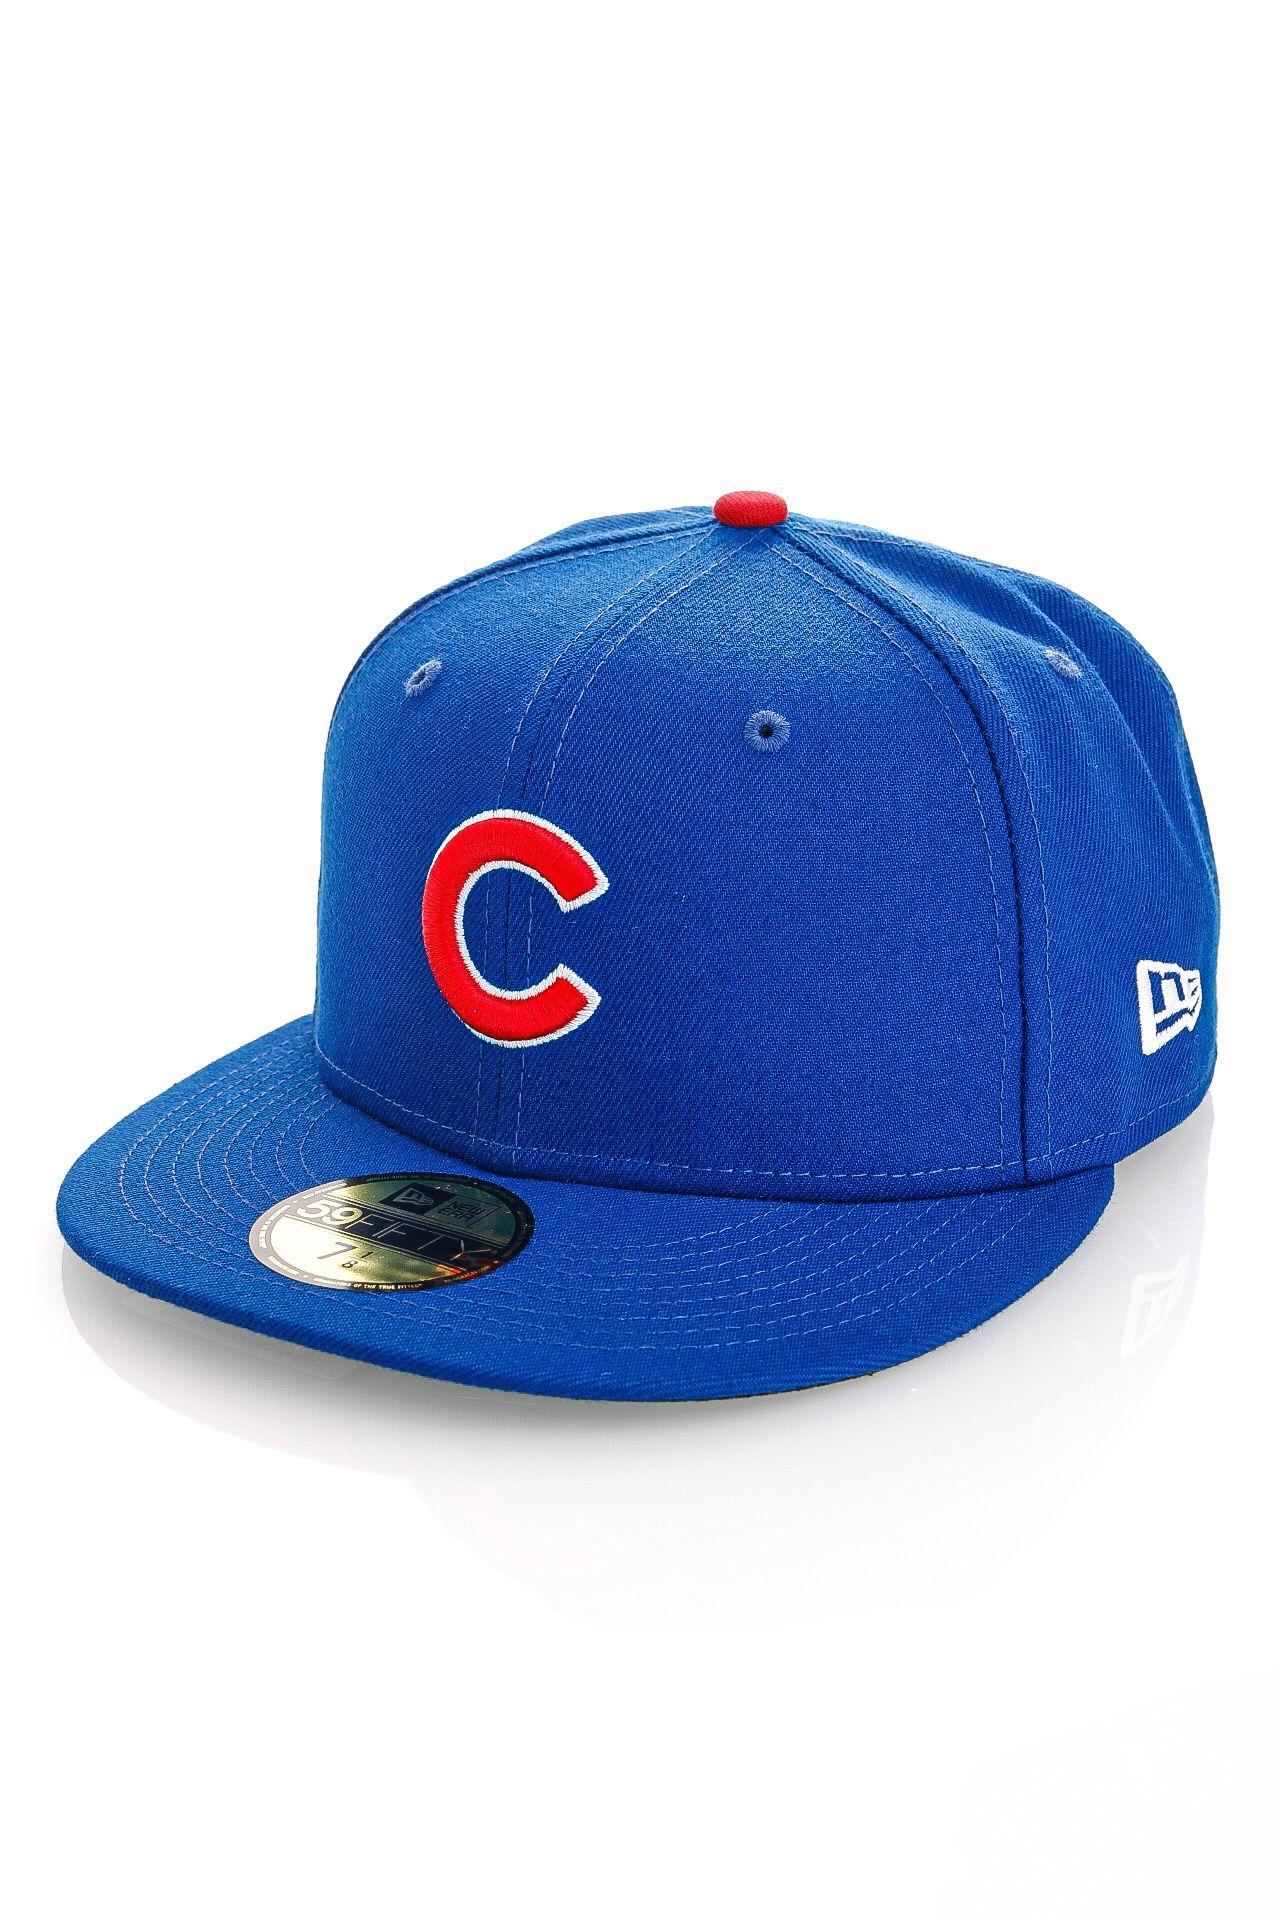 Afbeelding van New Era Fitted Cap MLB AC Perf 5950 BLUE 12572846